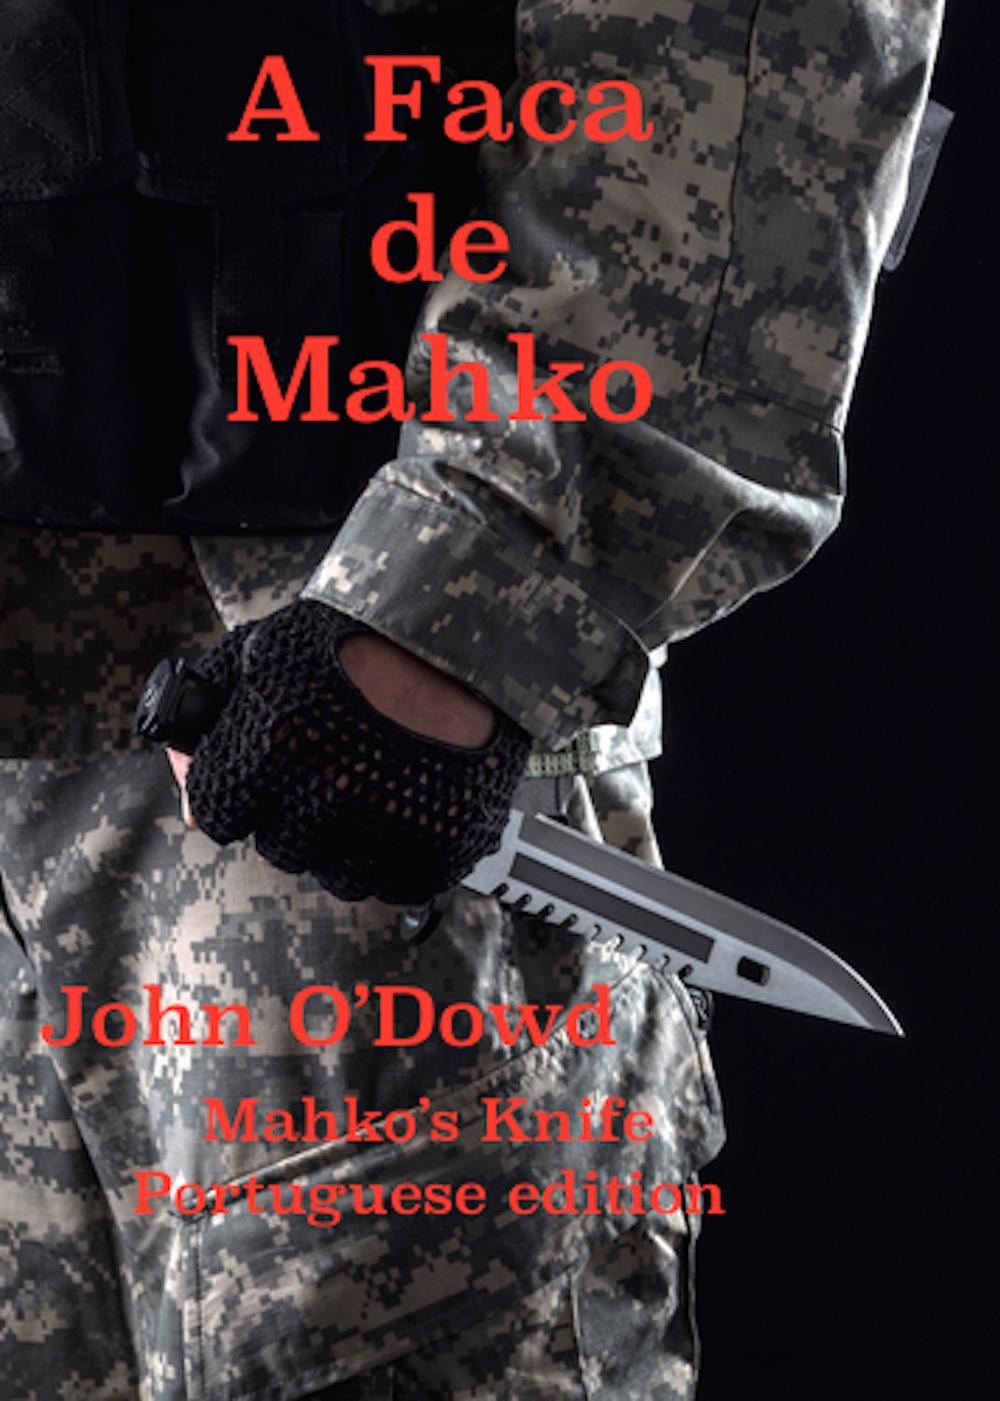 Faca de Mahko cover 72 dpi (1).jpg